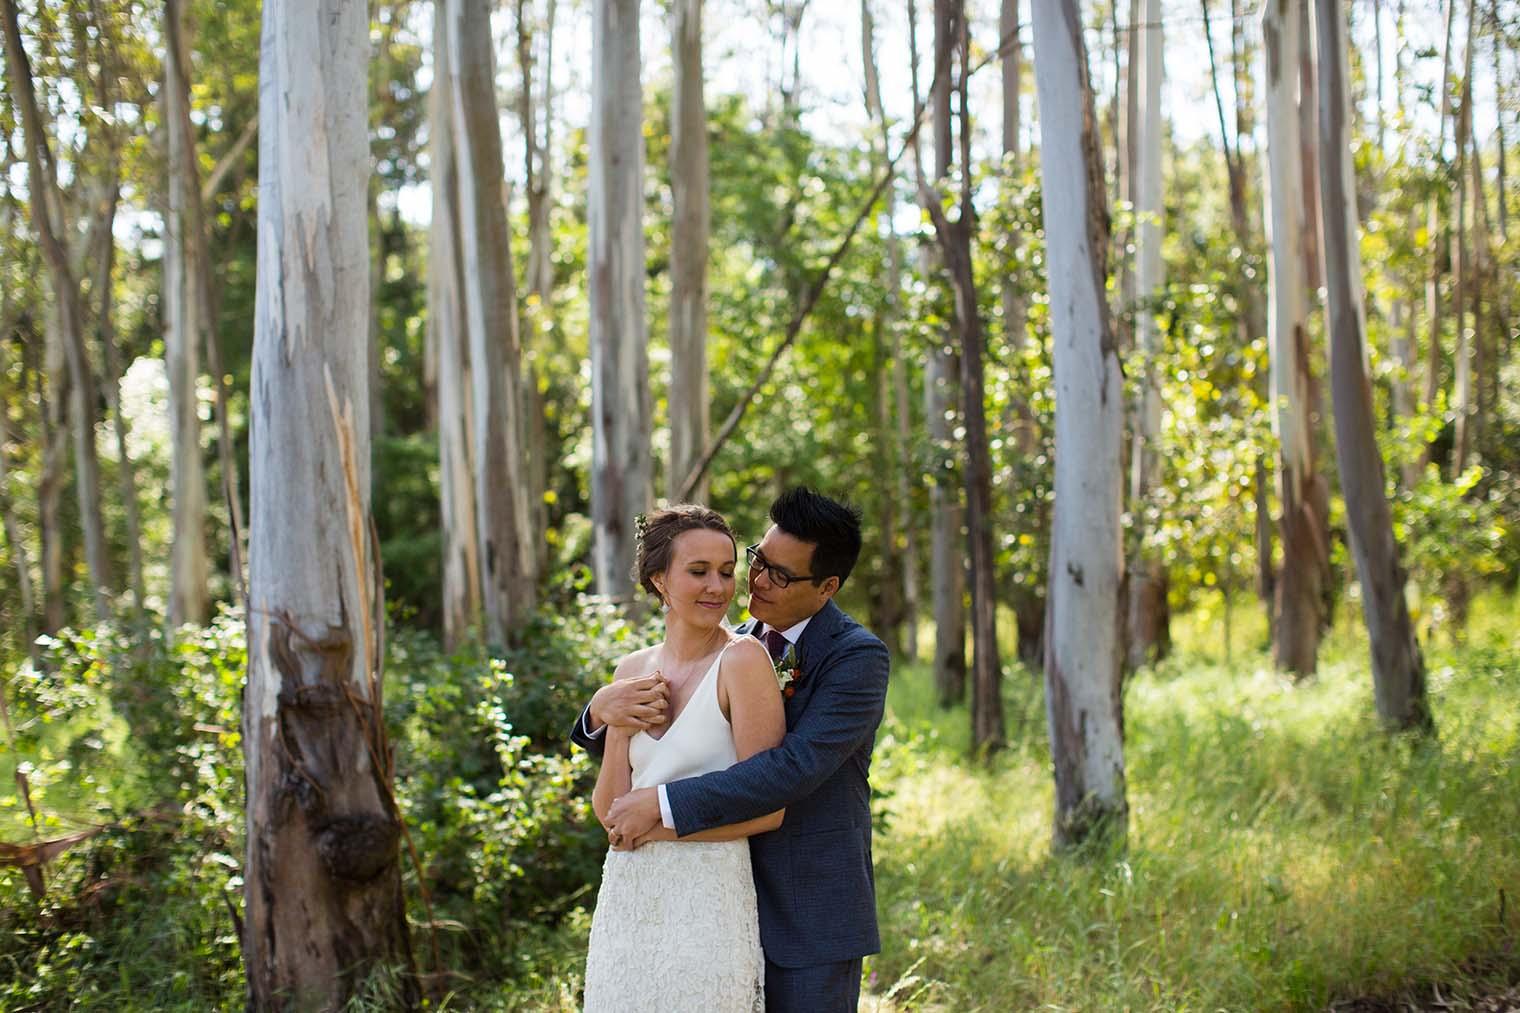 jack london state historic park wedding photos